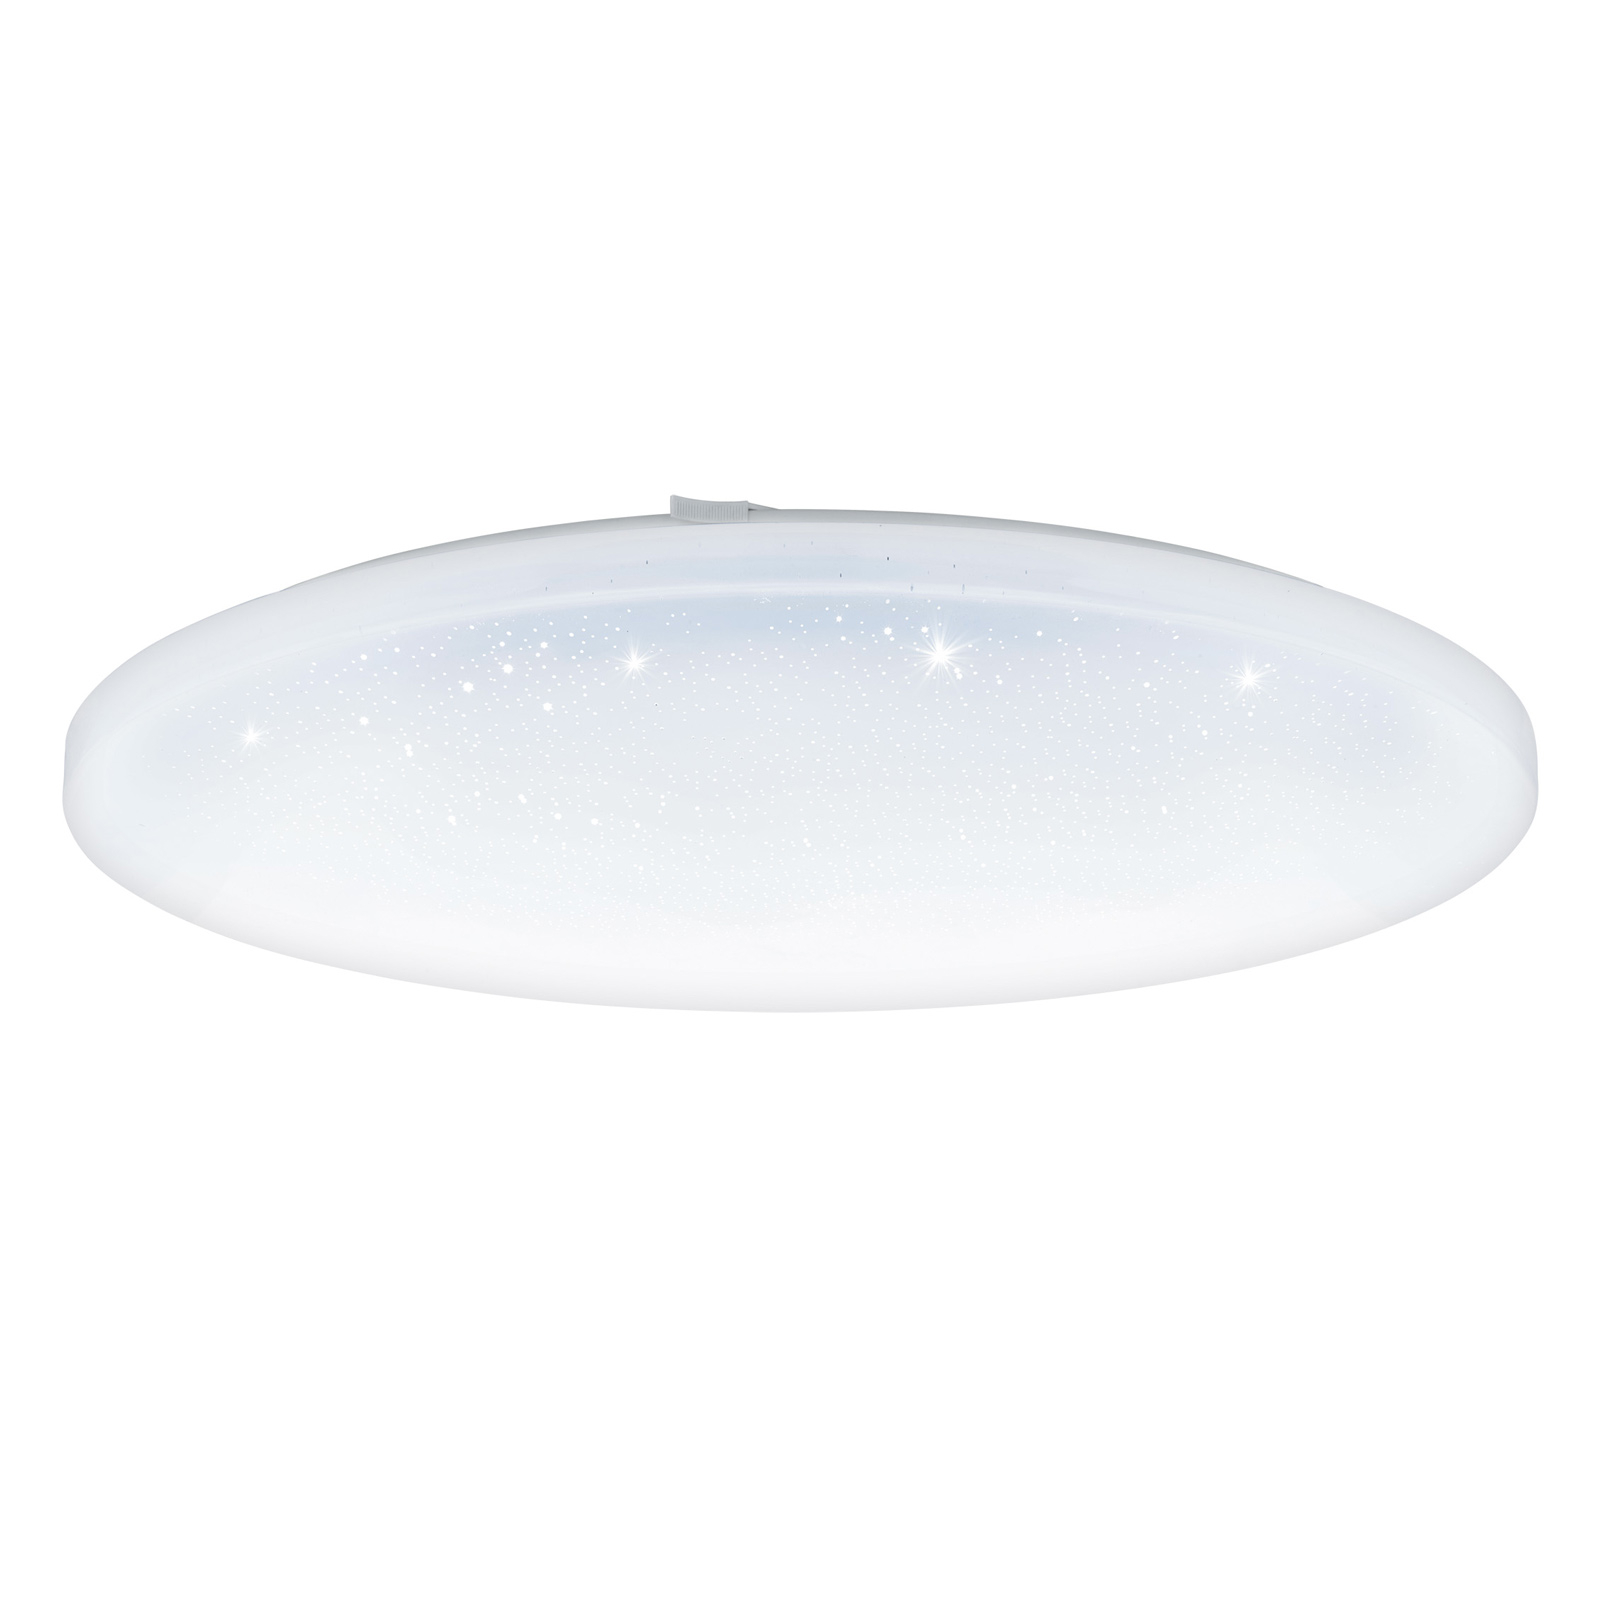 LED-taklampe Frania med krystalleffekt, rund